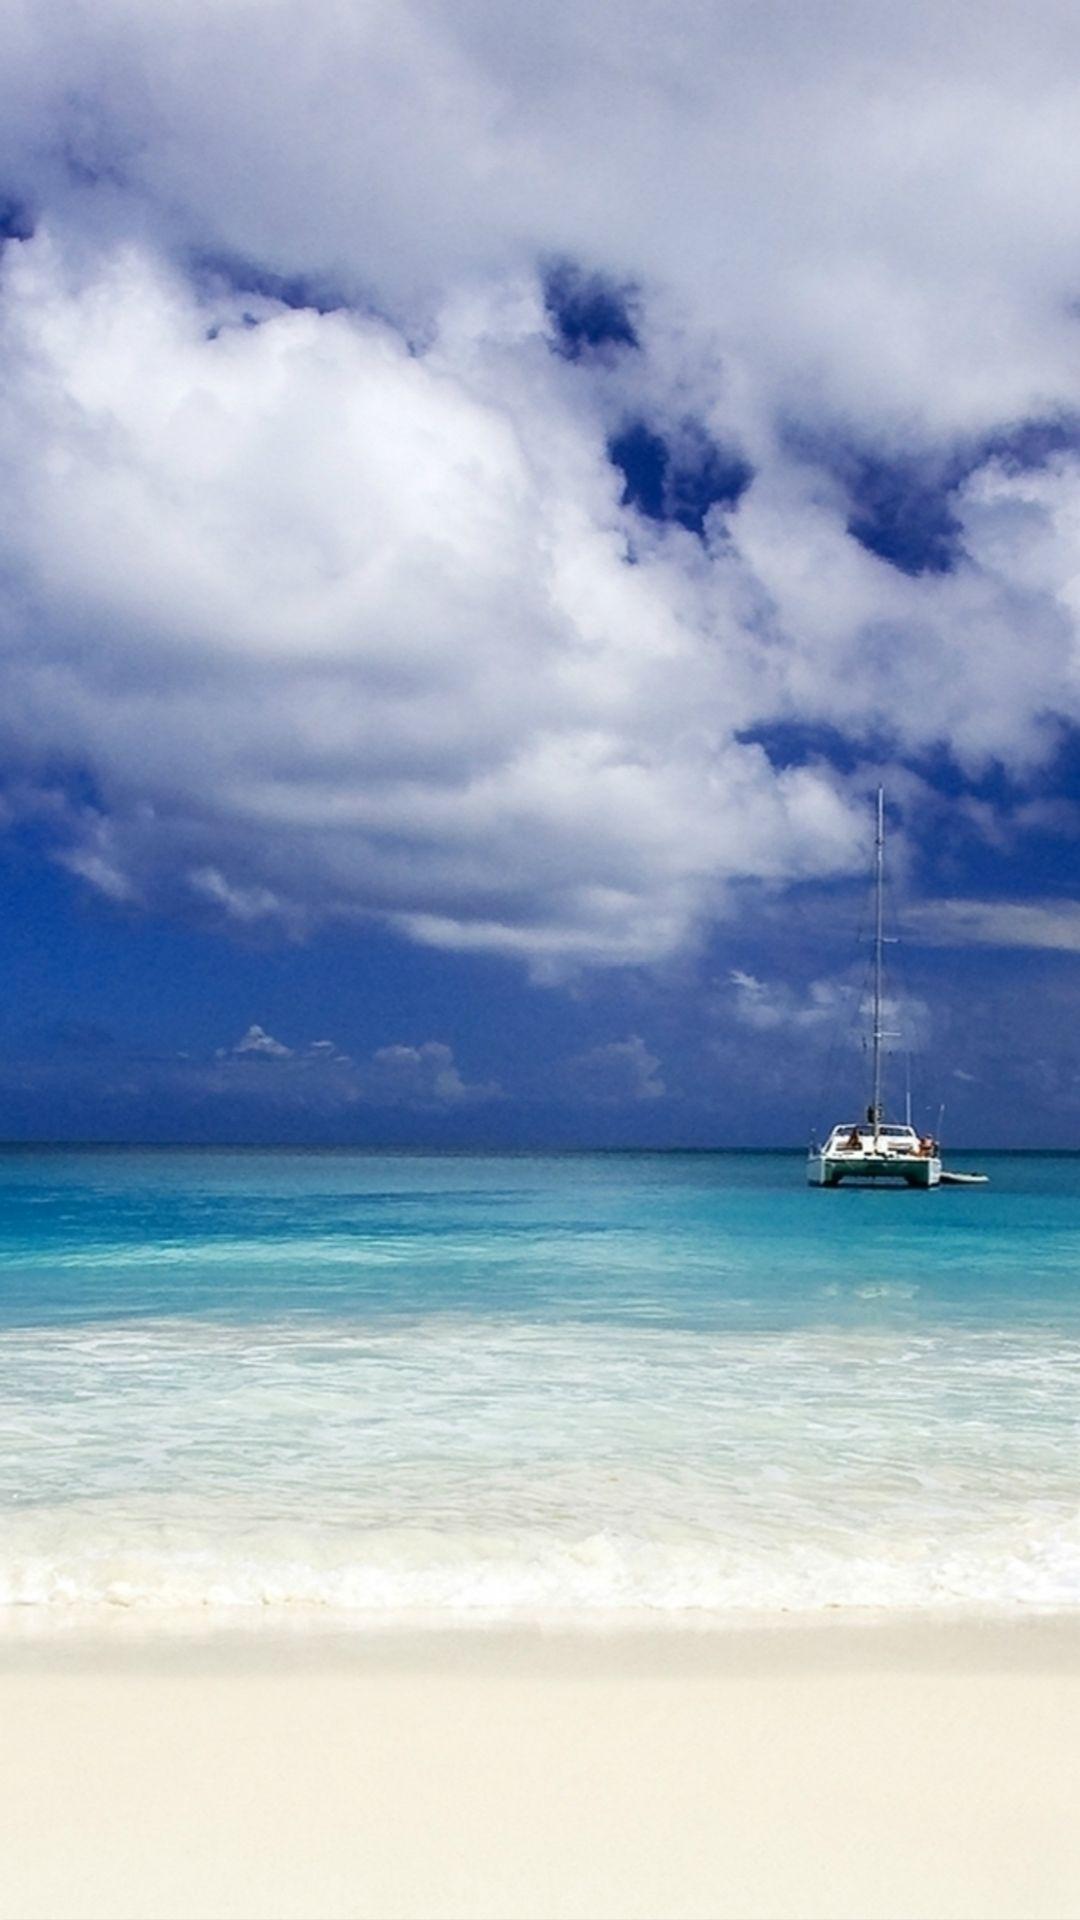 Wallpaper iphone bright - Pure Bright Sunny Ocean Beach Sea View Skyline Boat Iphone 6 Plus